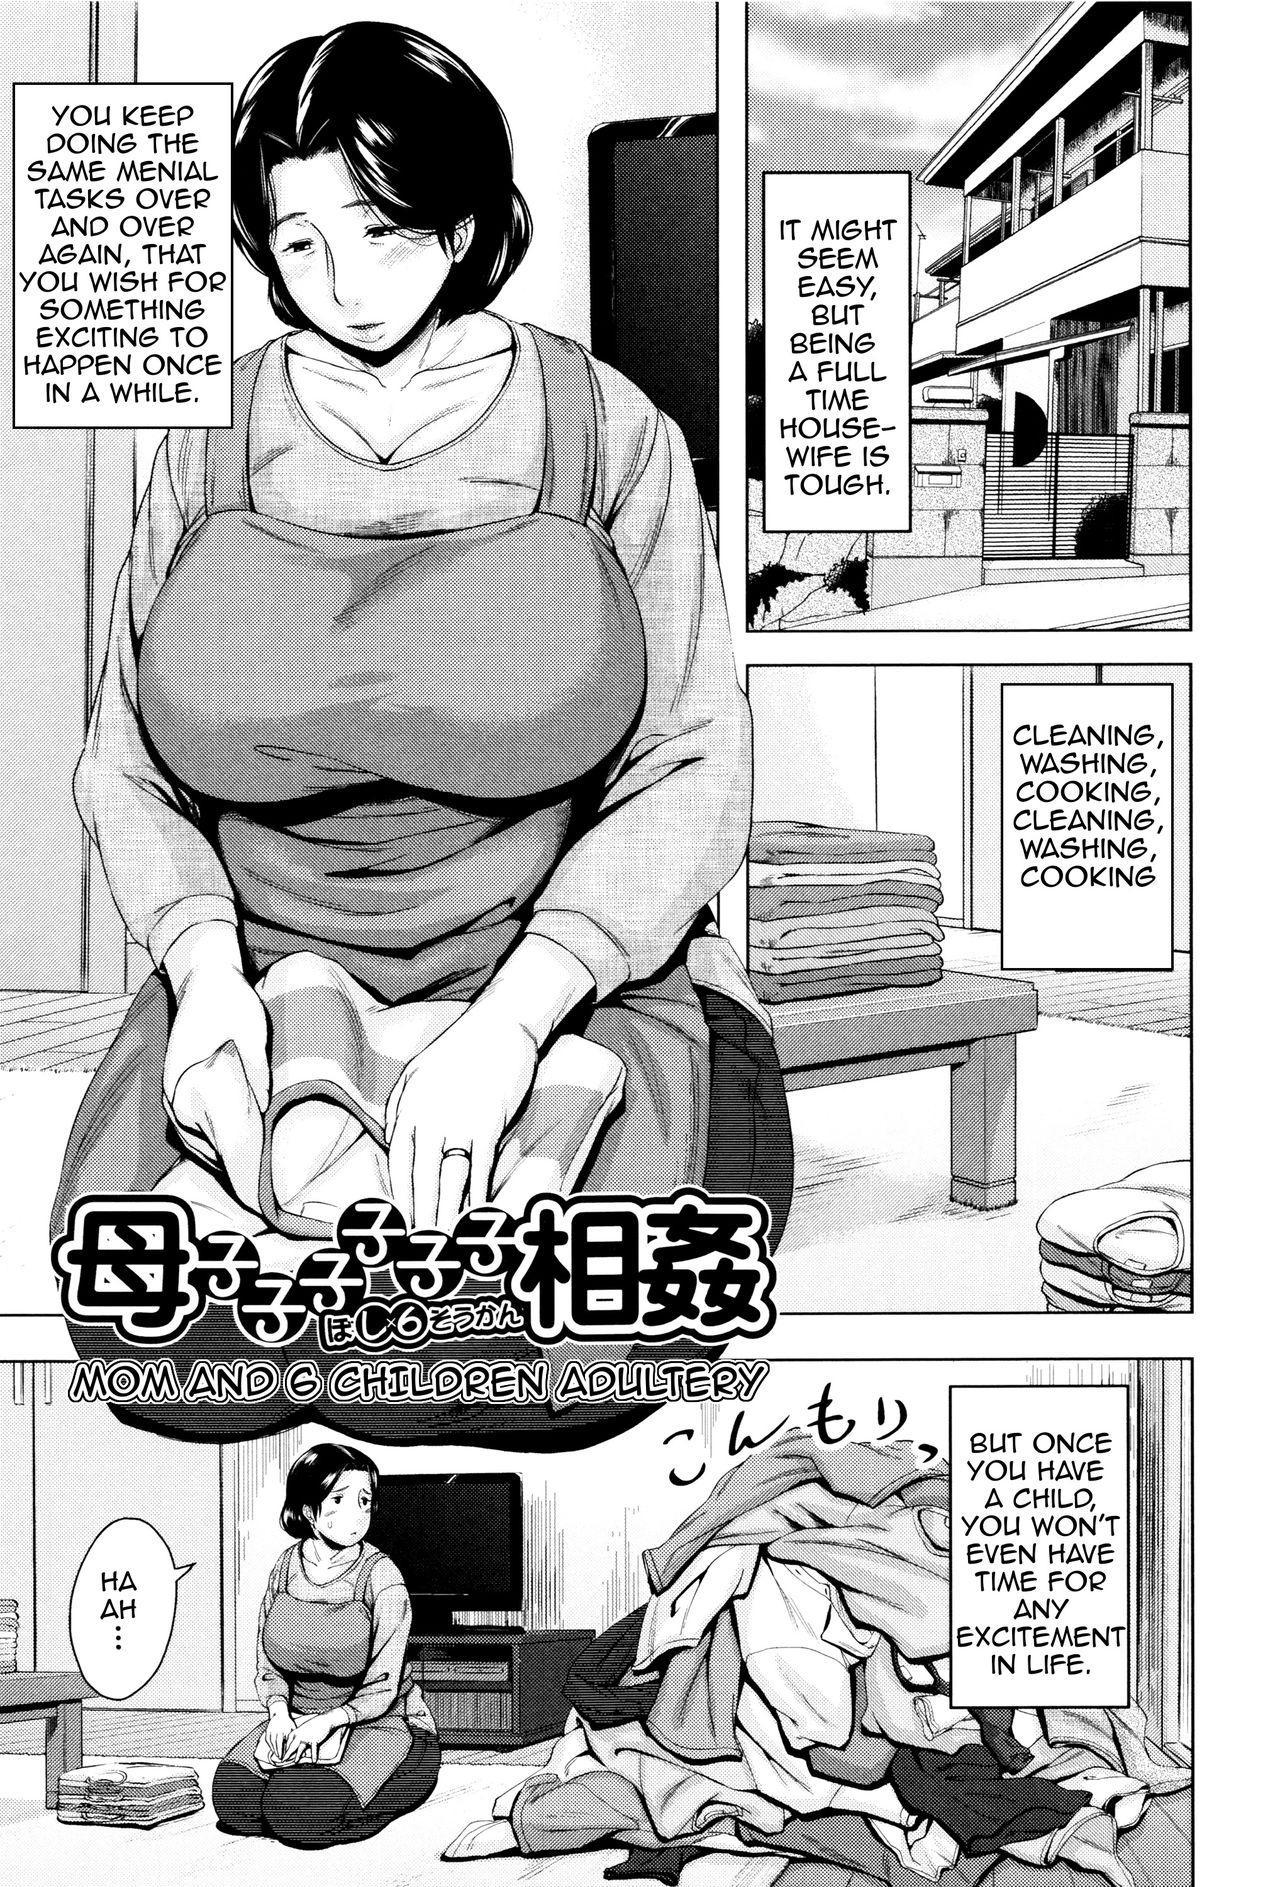 [Jitsuma] Kinyoubi no Haha-tachi e - To Friday's mothers [English] [Amoskandy, desudesu, Kusanyagi] 67